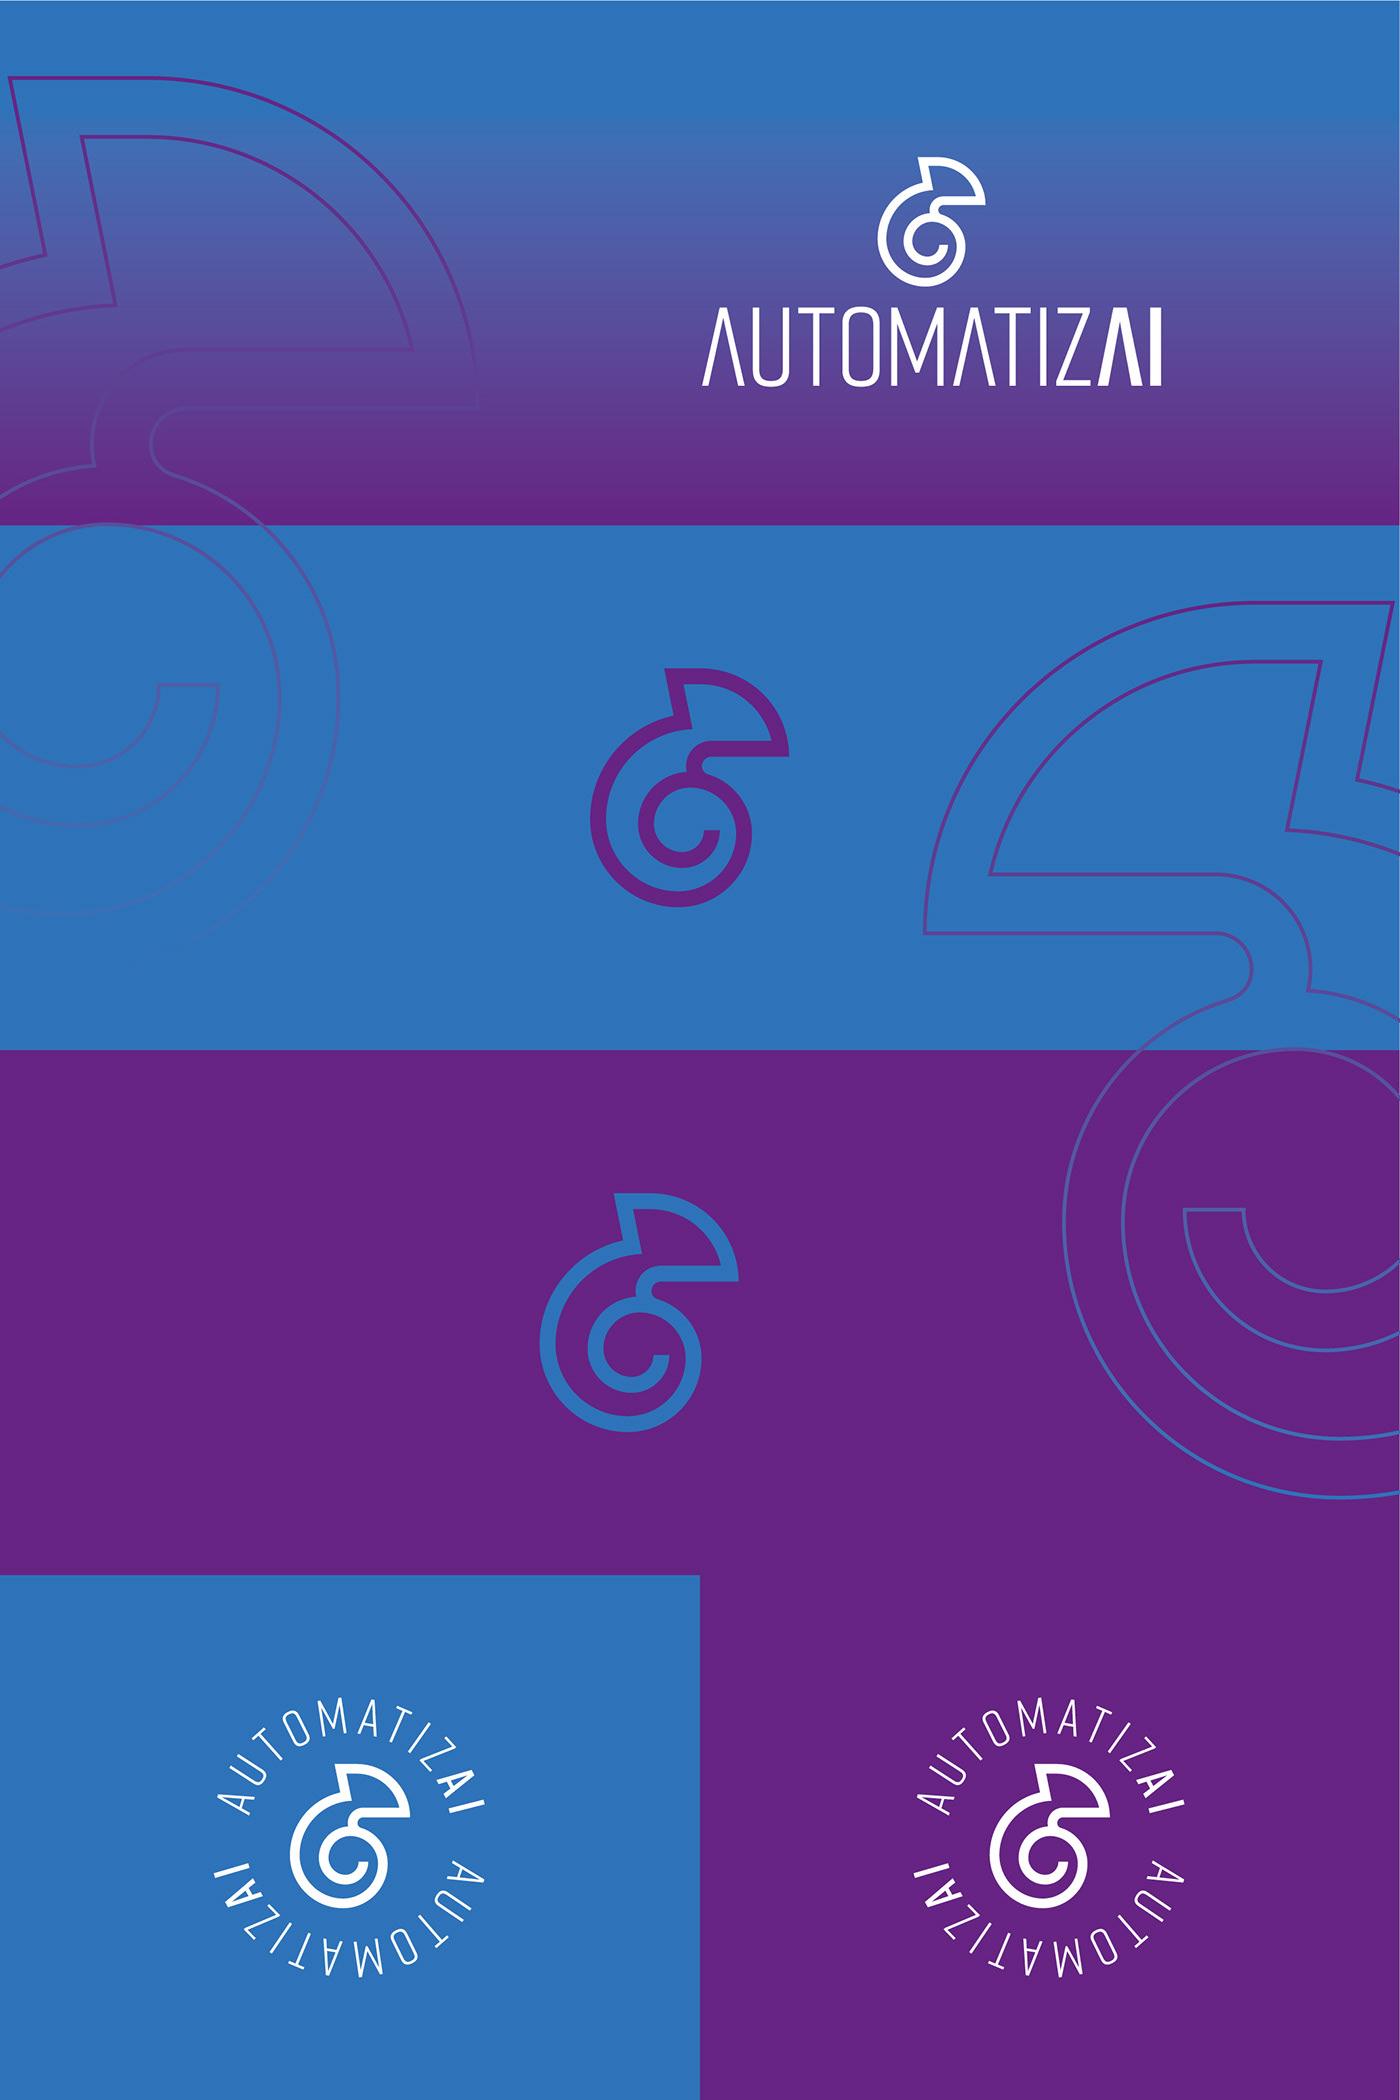 adaptability algorithm artificial intelligence chamaleon Data Automation digital industry 4.0 innovation modern Technology